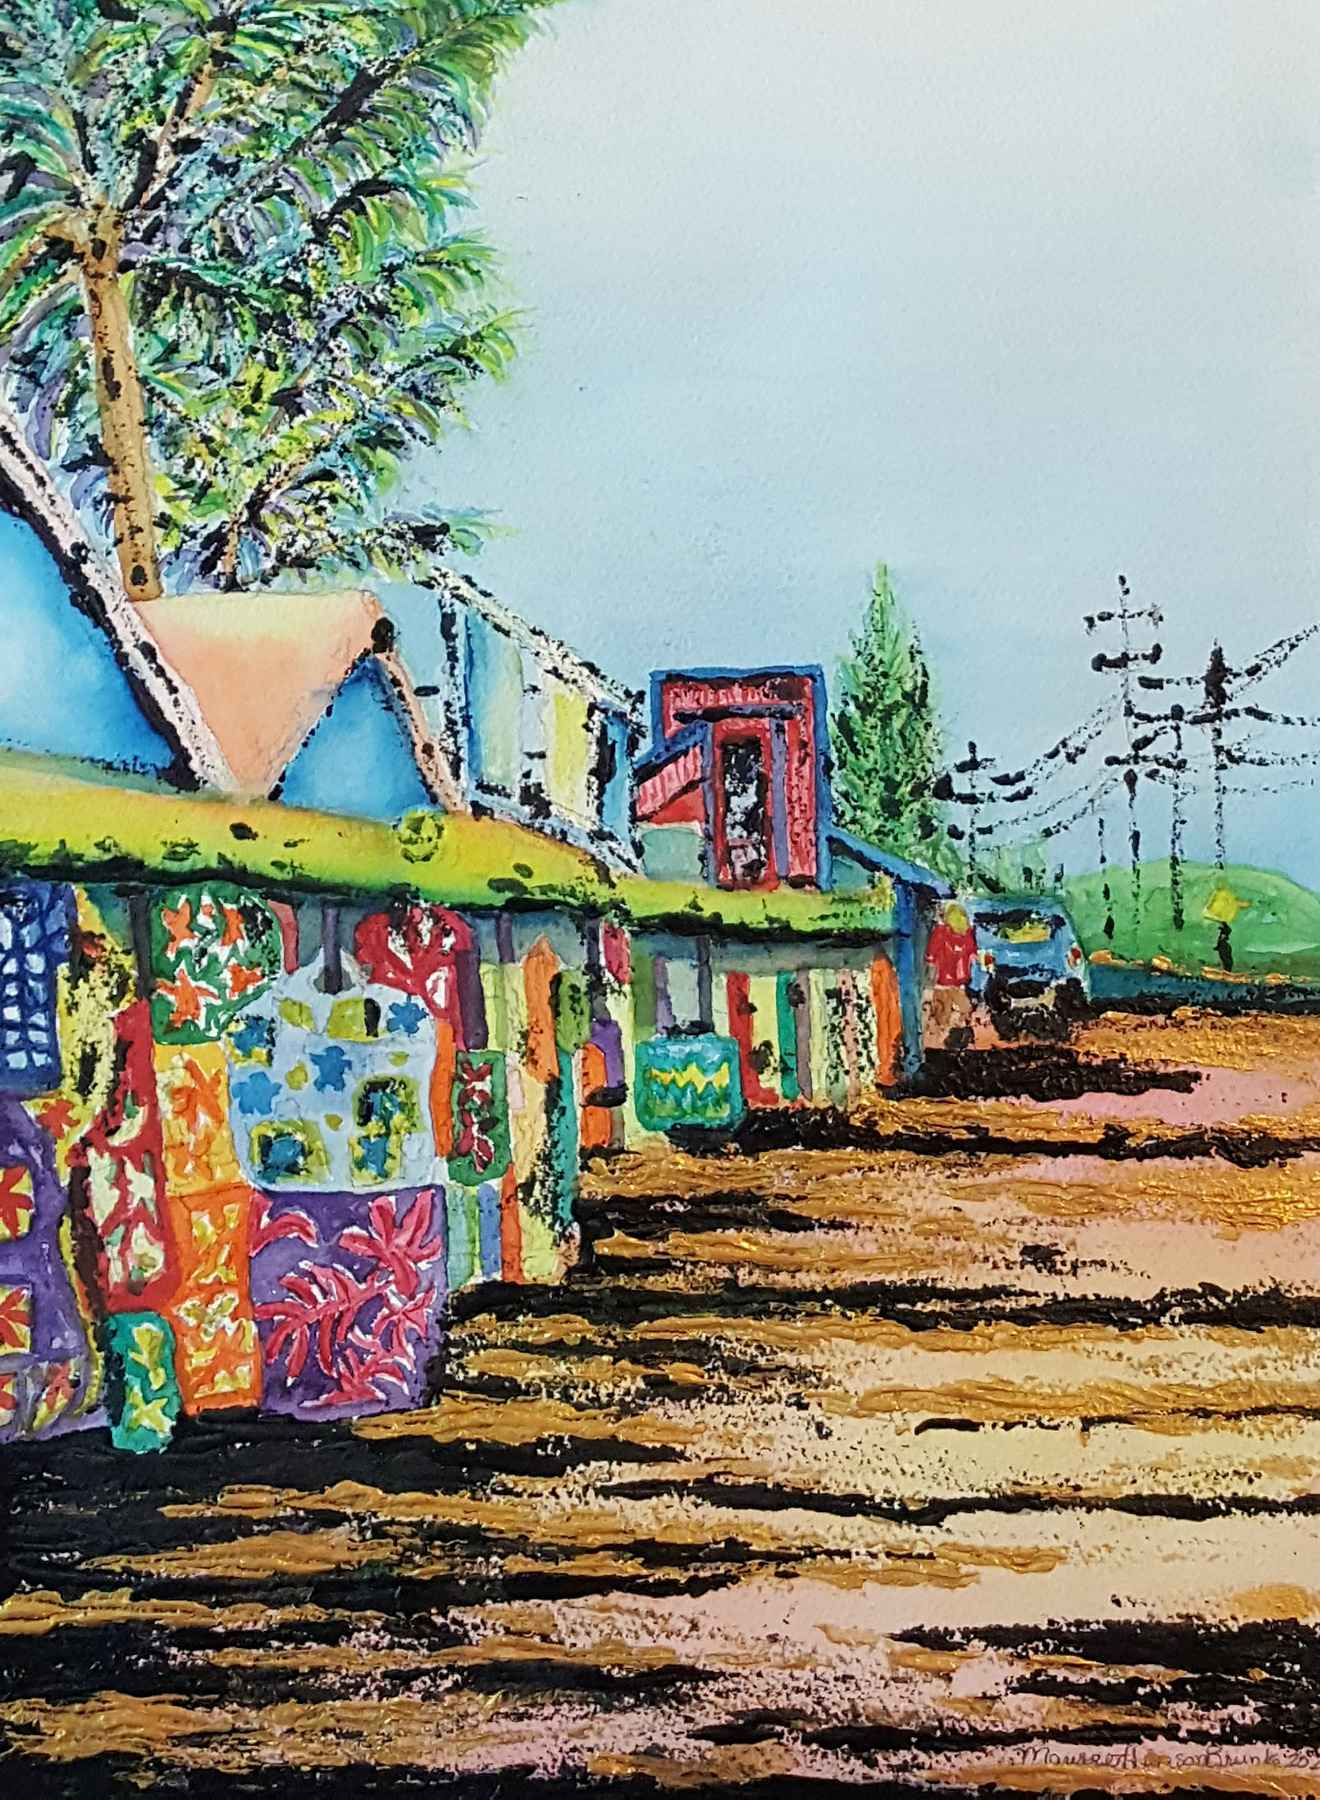 Kauai Street Market by  Maureen Henson-Brunke - Masterpiece Online